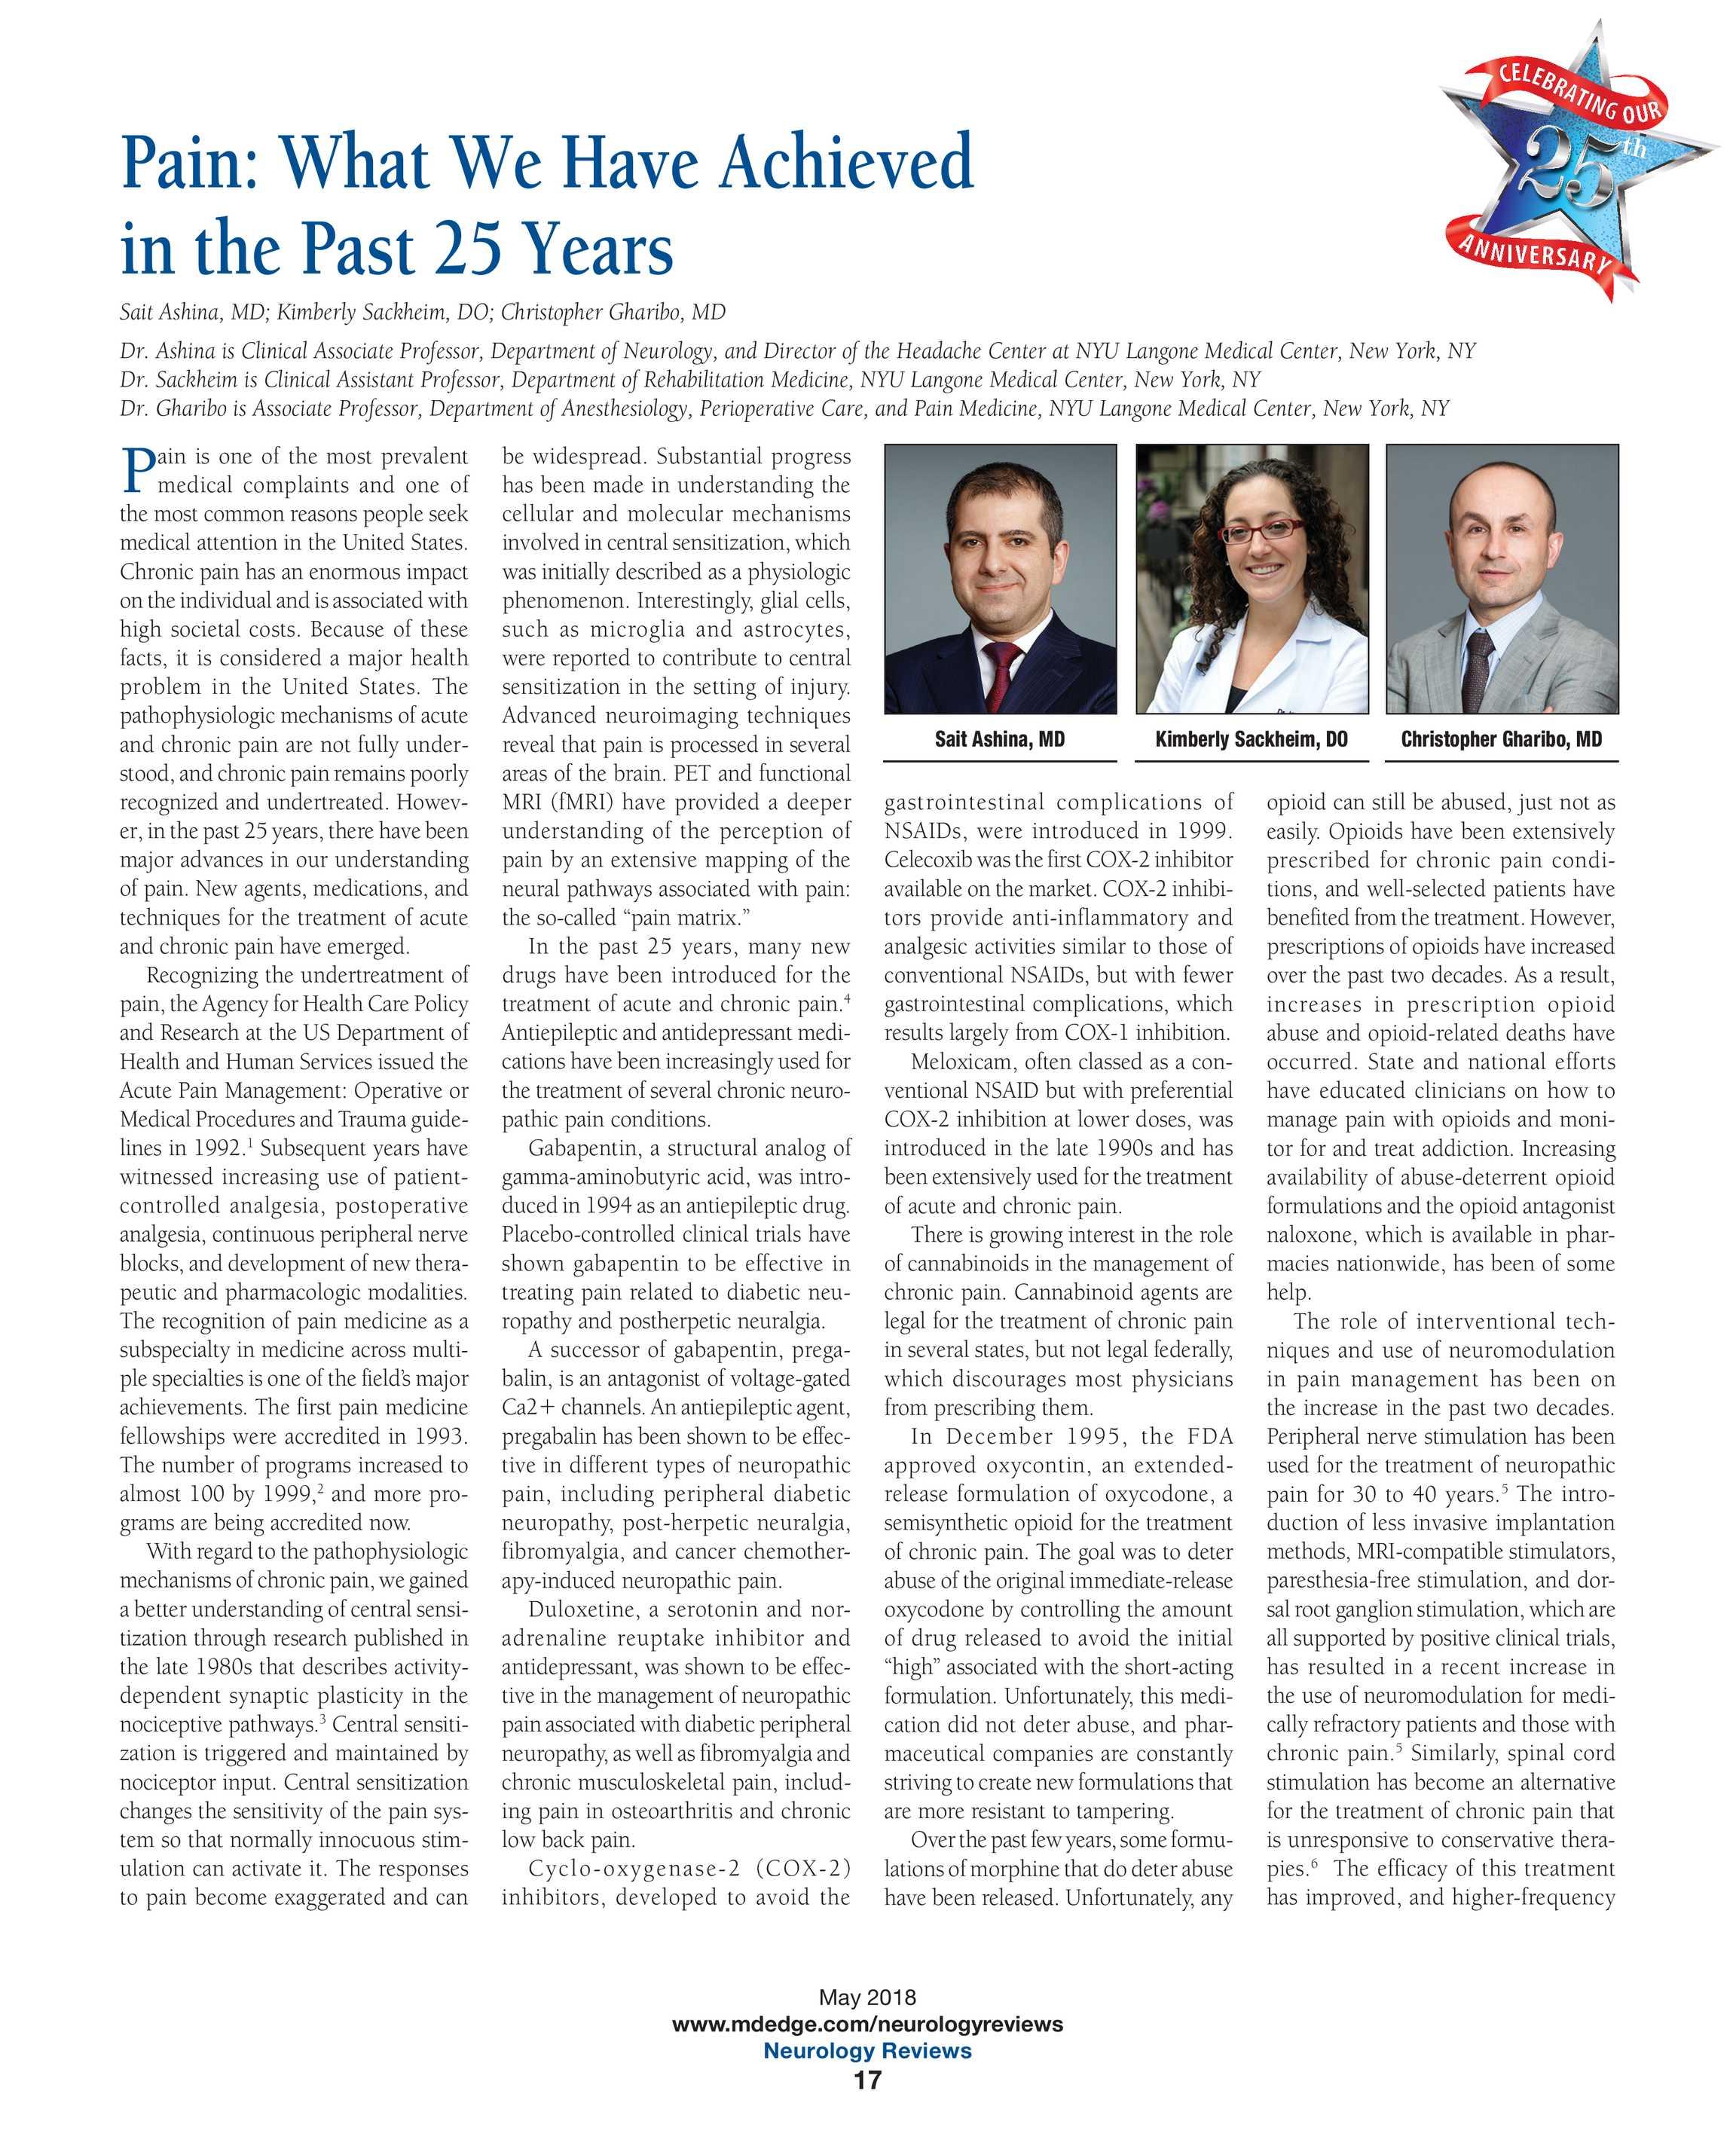 Neurology Reviews - NR MAY 2018 - page 17